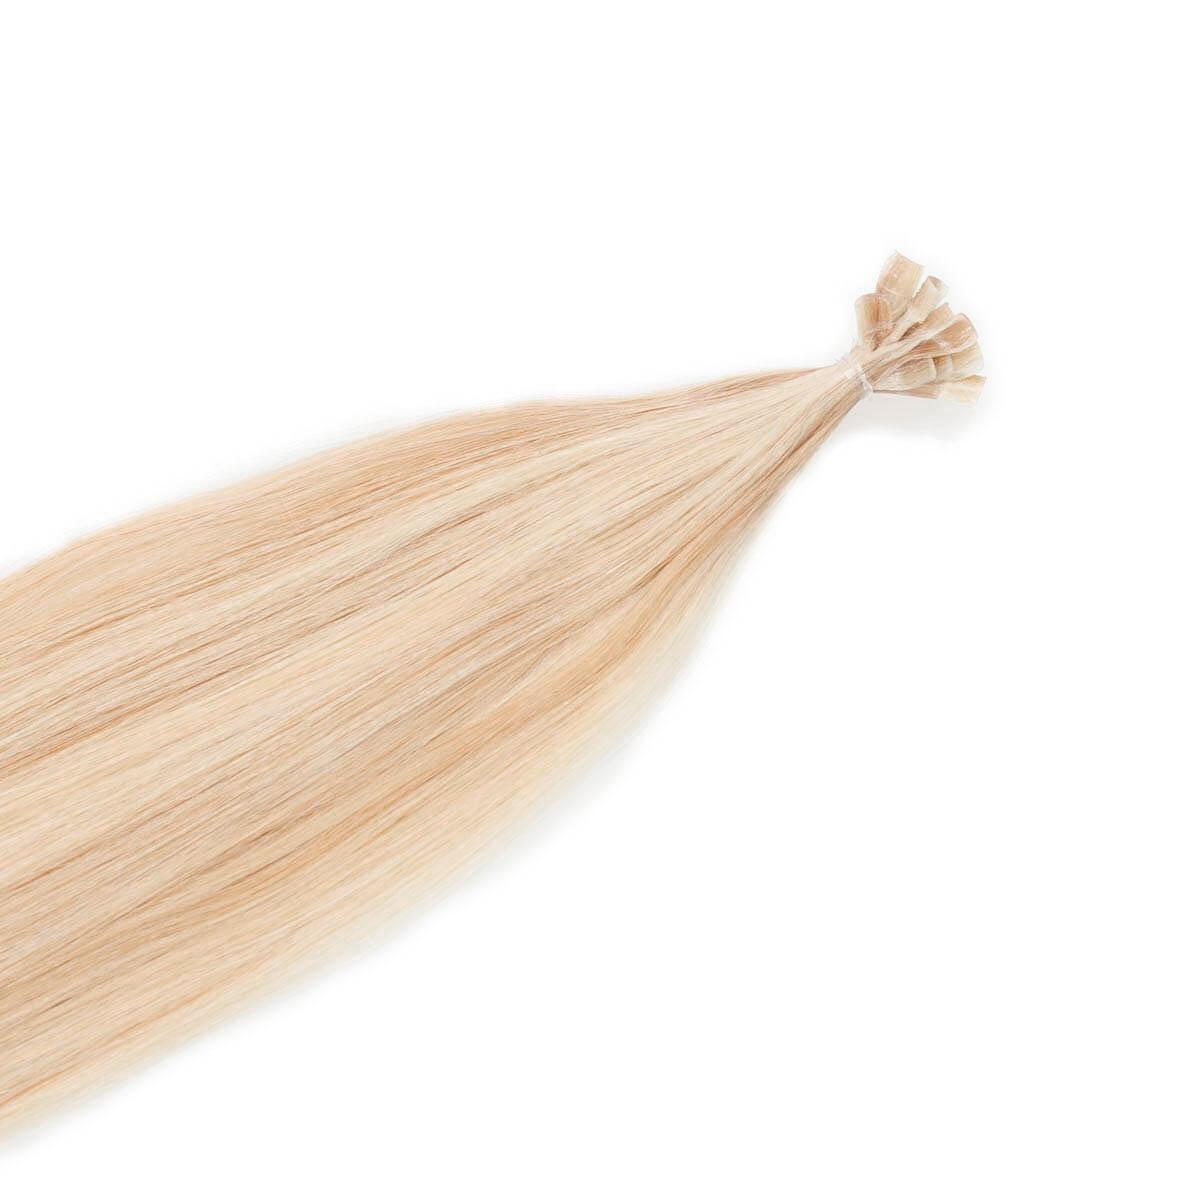 Nail Hair Original M7.5/10.8 Scandinavian Blonde Mix 60 cm